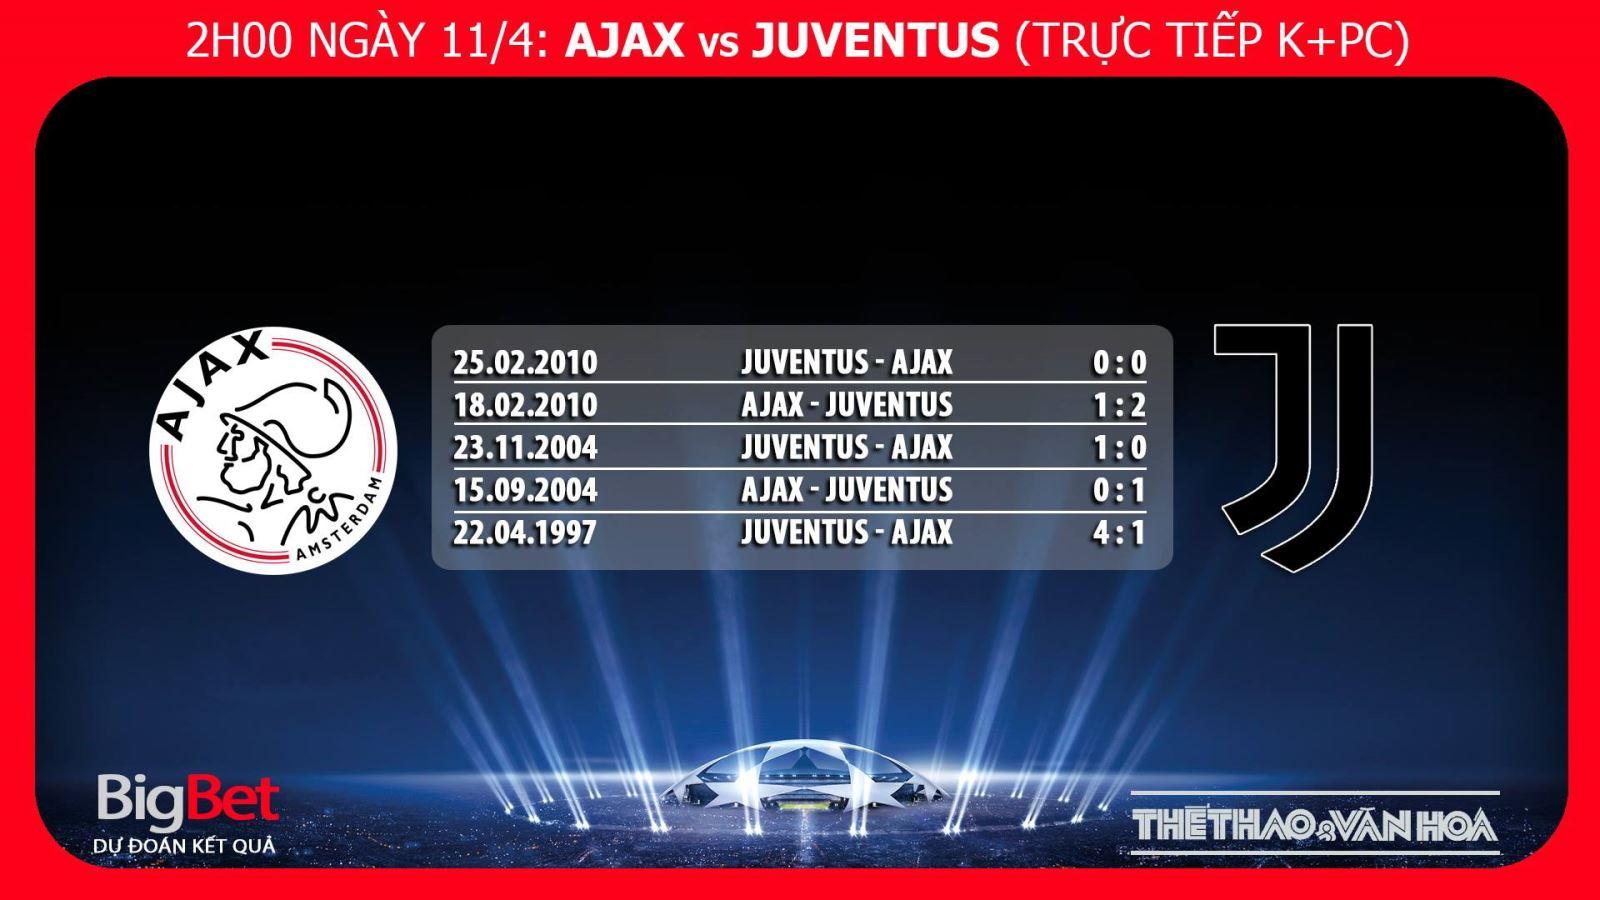 Trực tiếp Ajax vs Juventus, xem trực tiếp Juventus vs Ajax, trực tiếp bóng đá Ajax vs Juventus, truc tiep Juve vs Ajax, xem truc tiep Ajax vs Juventus o dau?